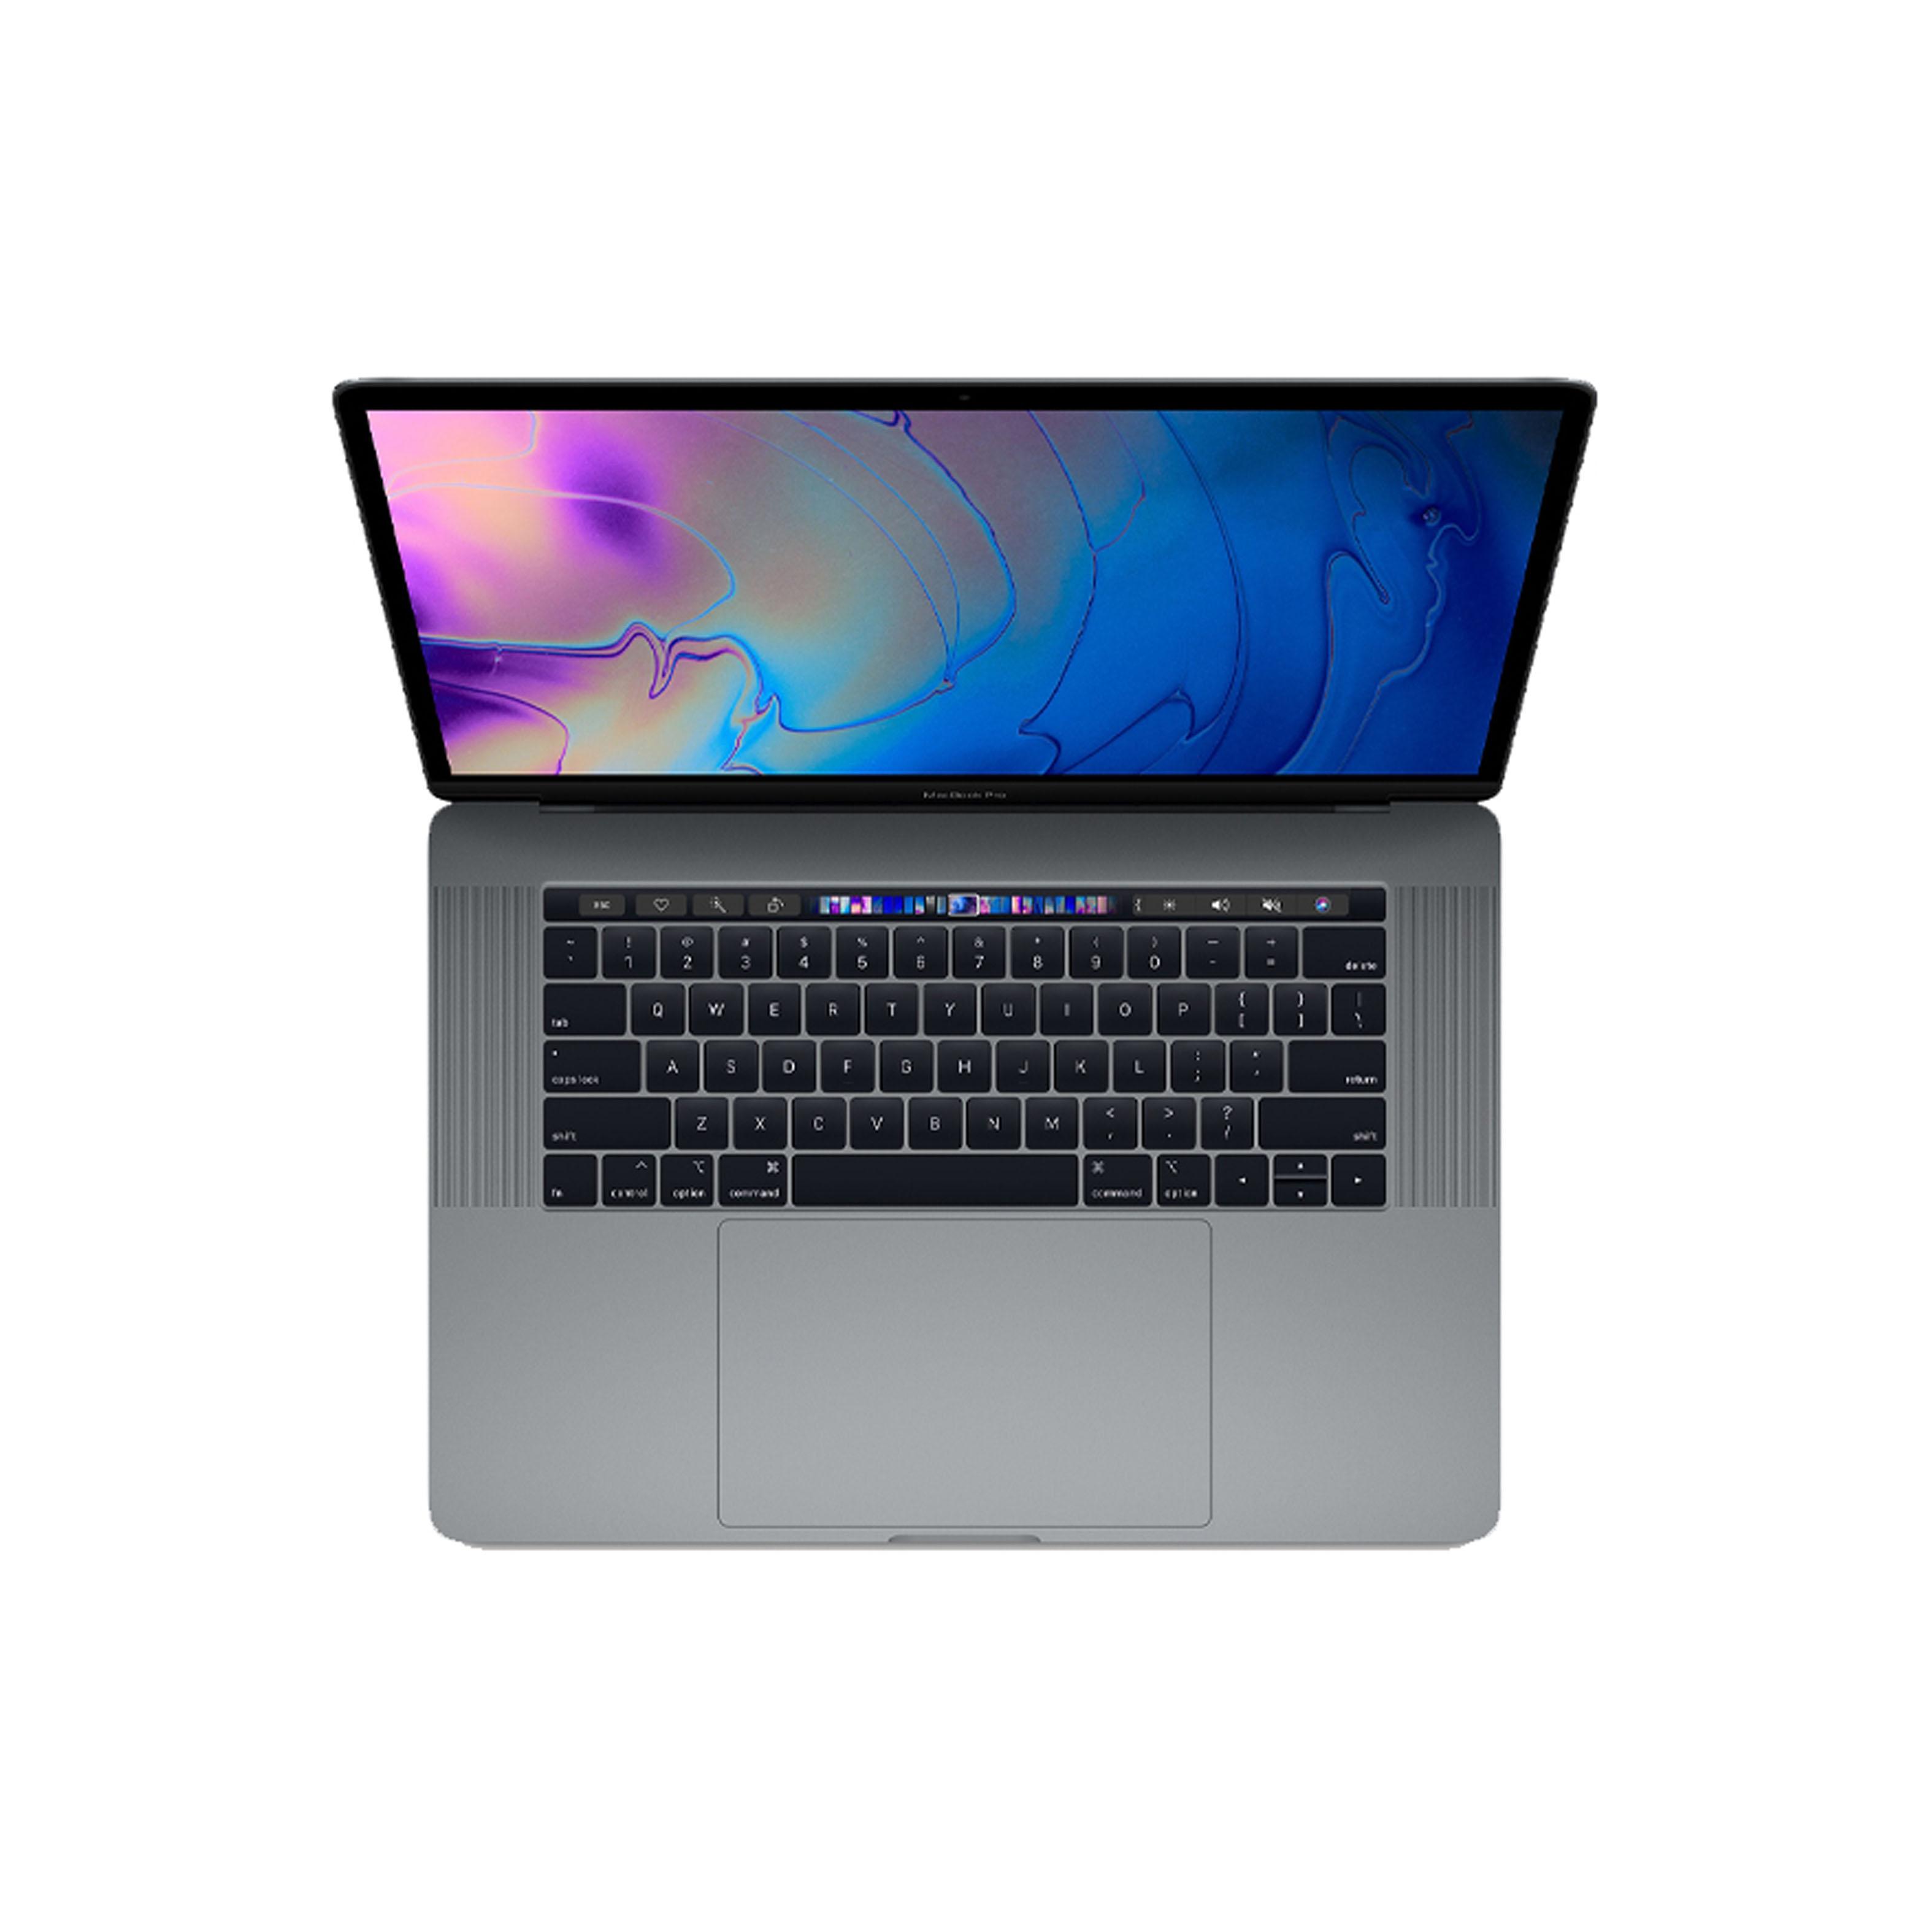 Apple 15in MacBook Pro  - 2.3GHz 9th Gen Intel i9 512GB - Space Grey (MV912X/A)